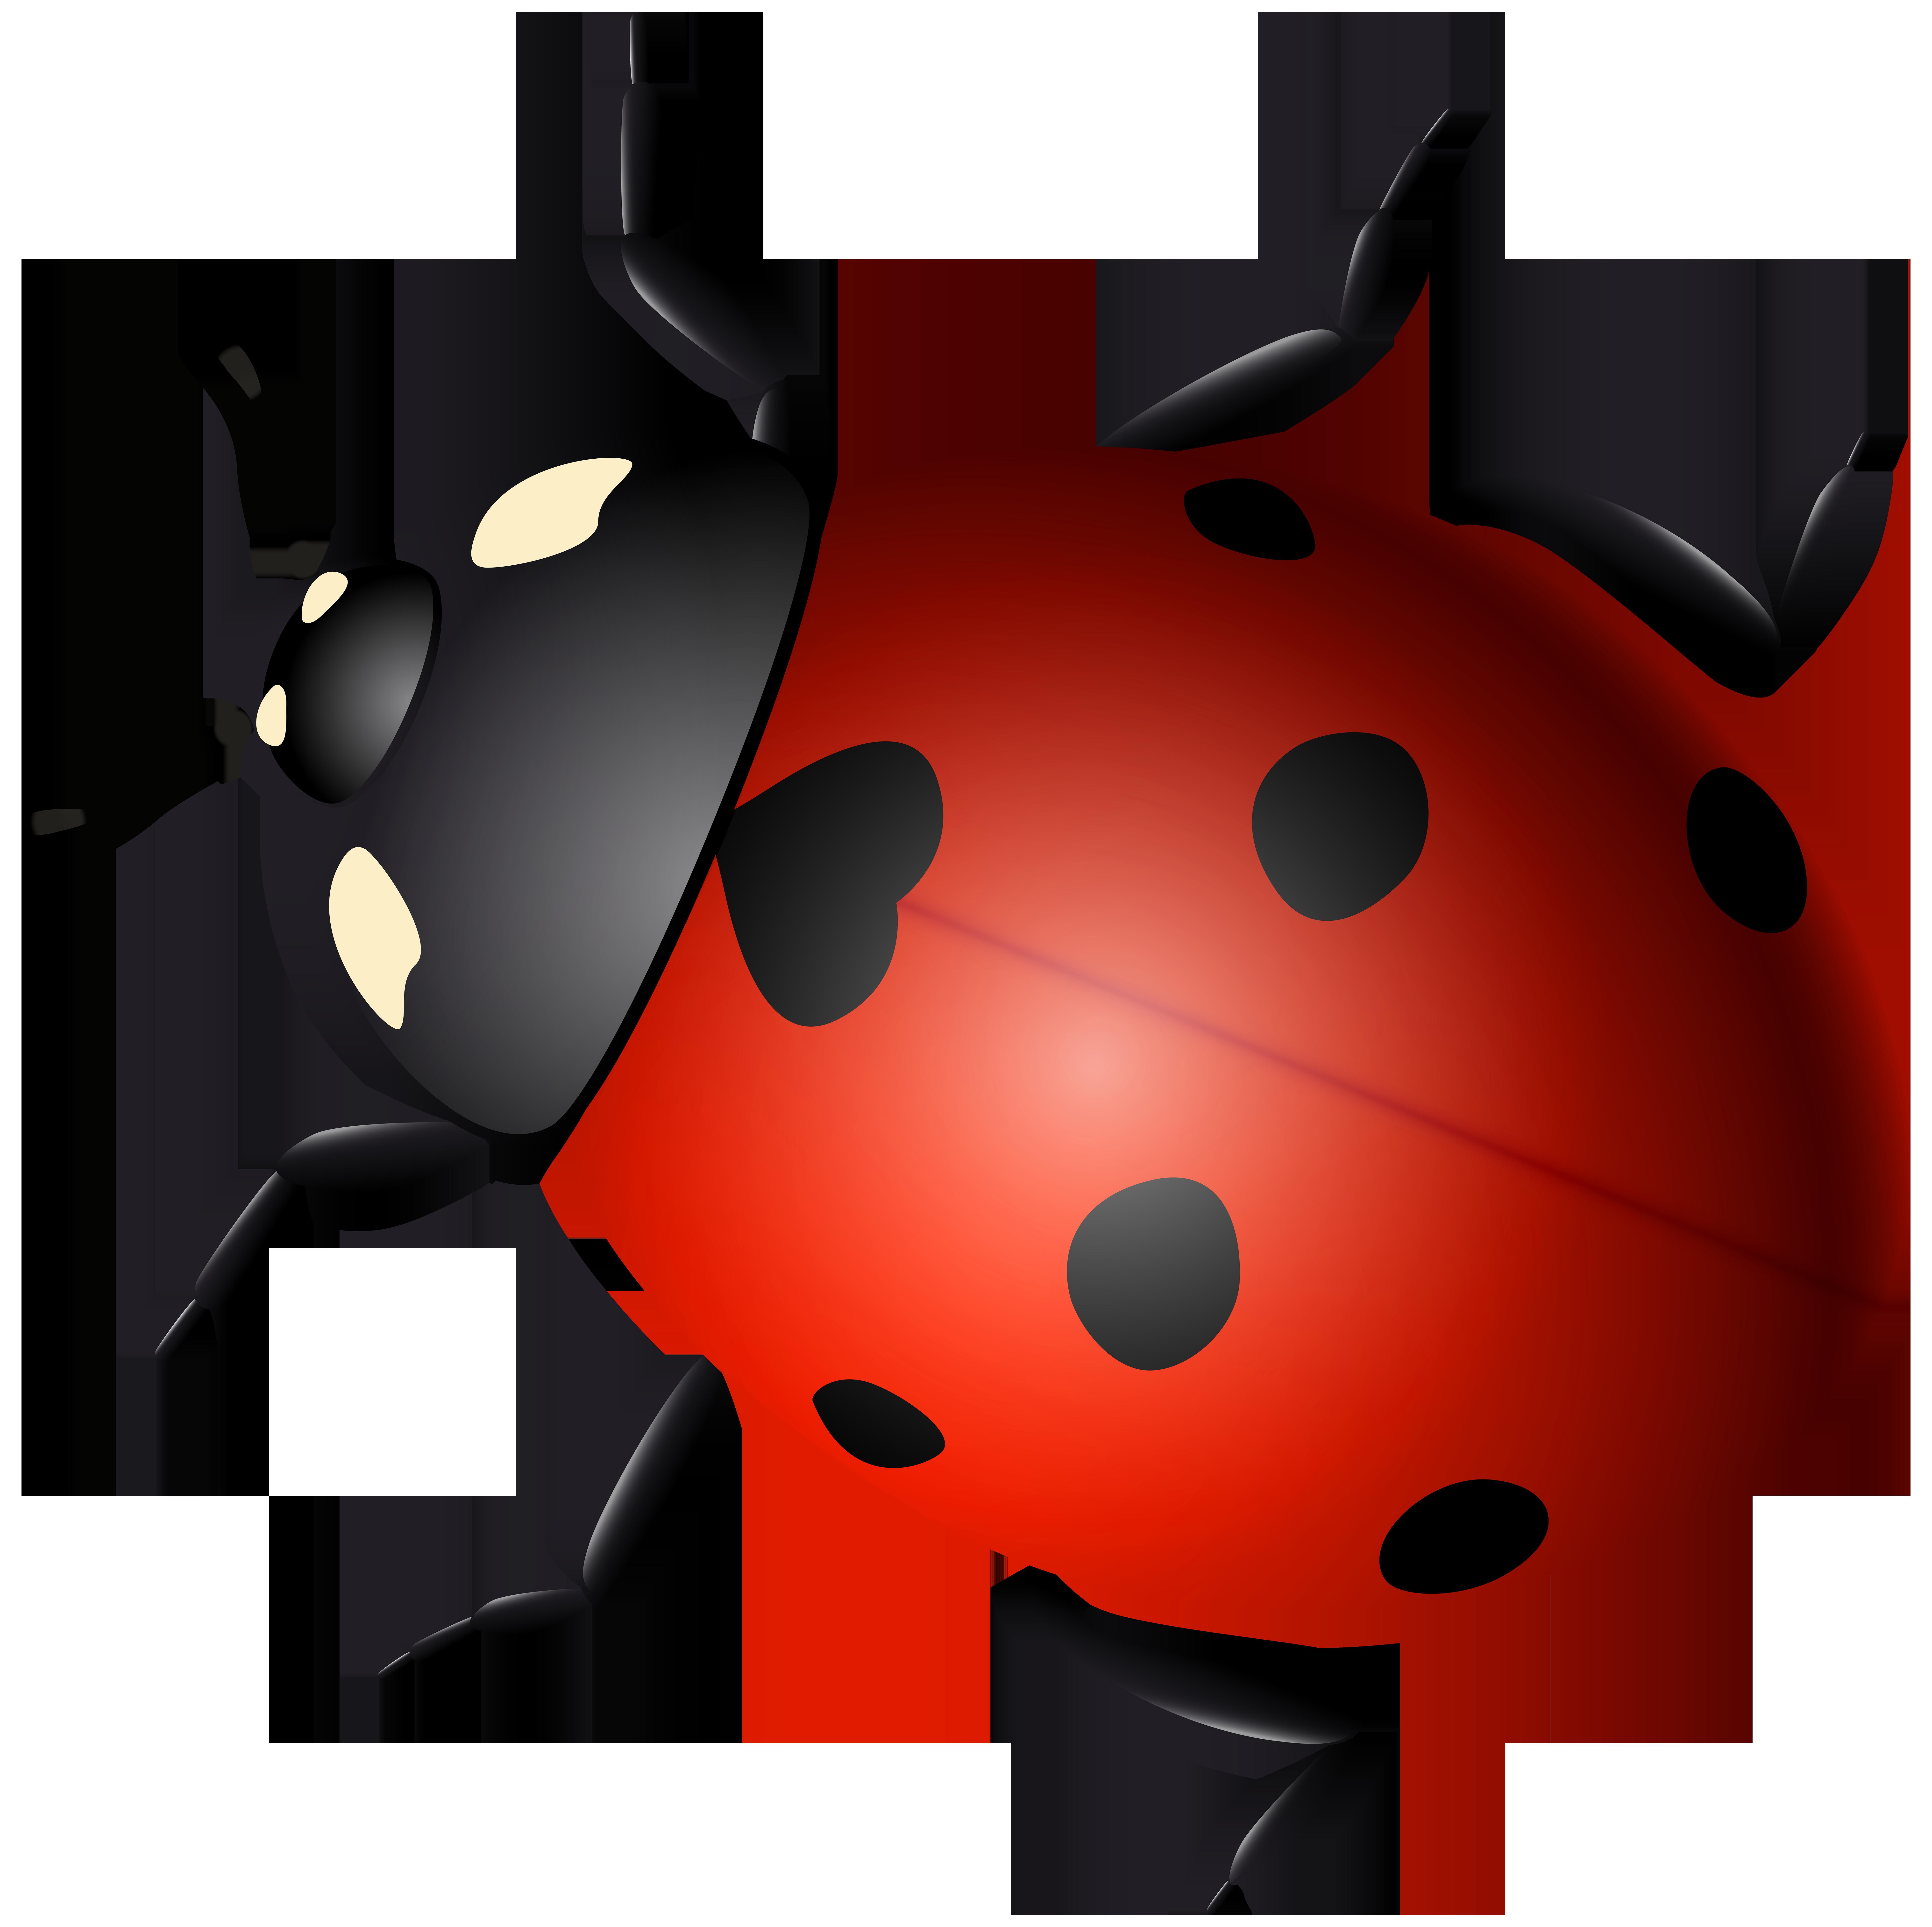 Ladybird Beetle Clip art.